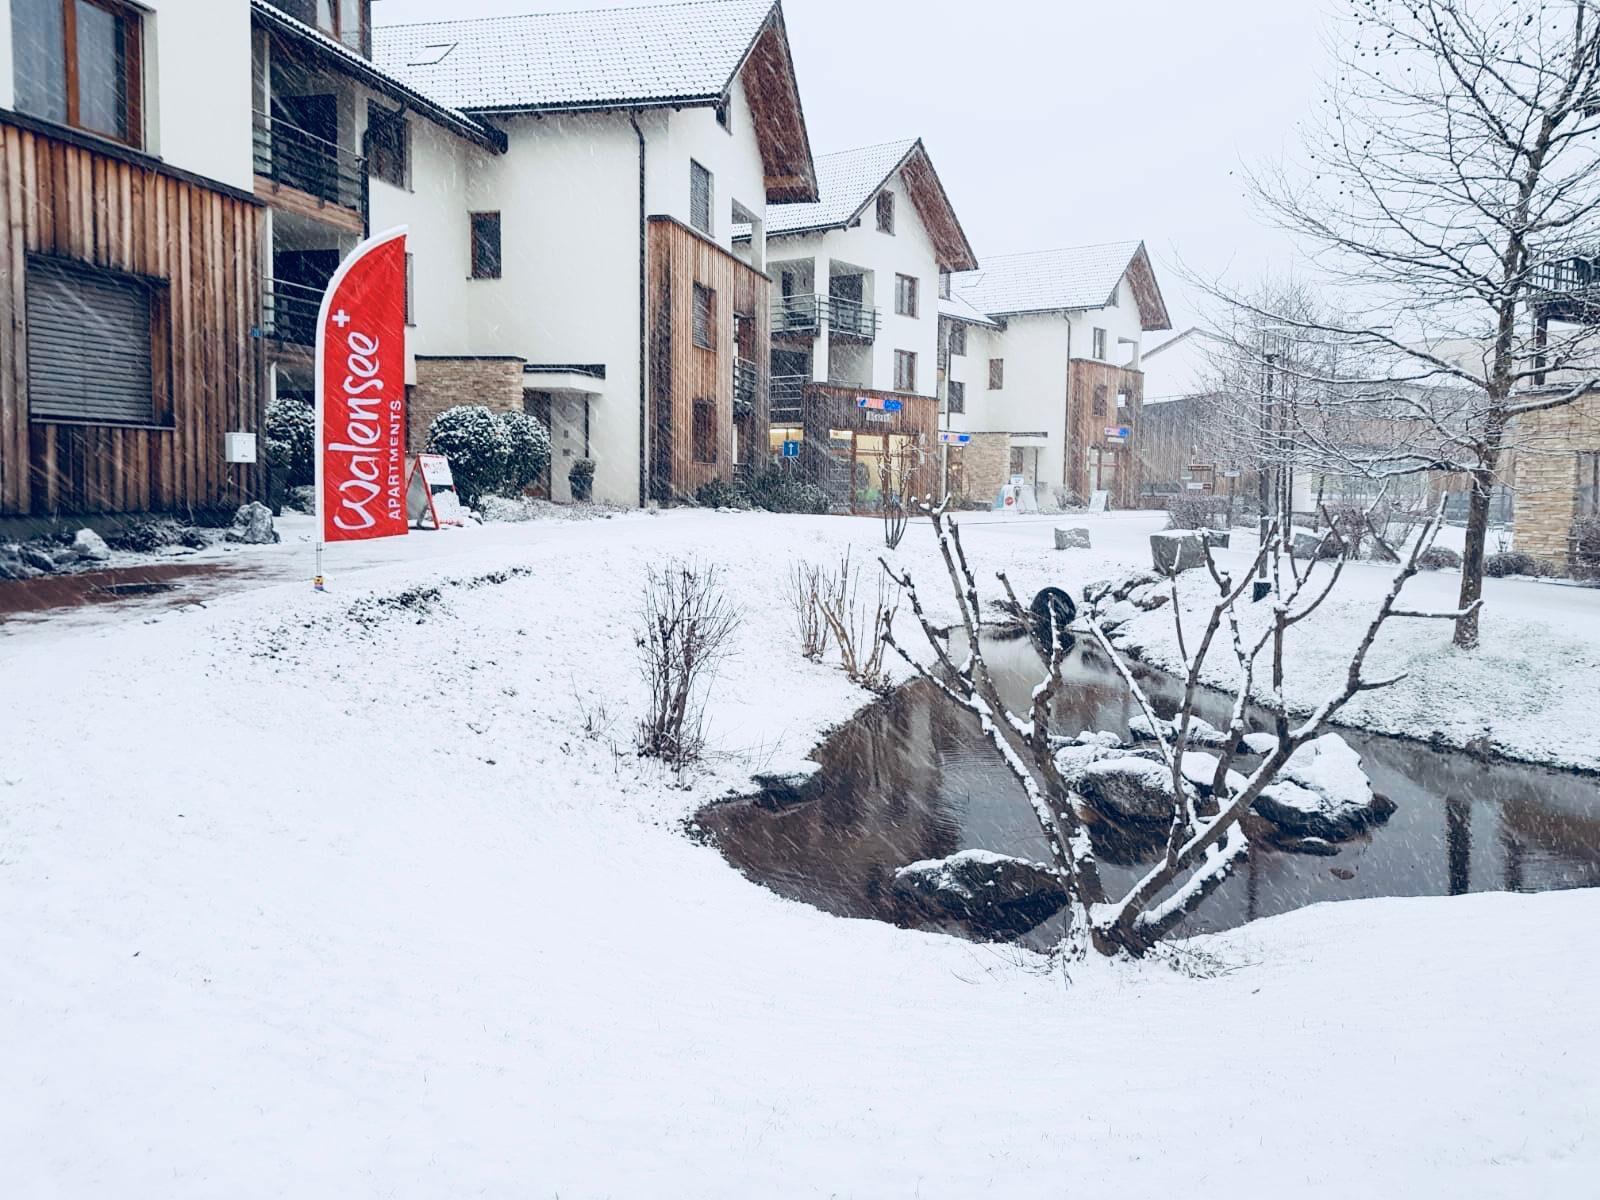 Ski Saison 2020